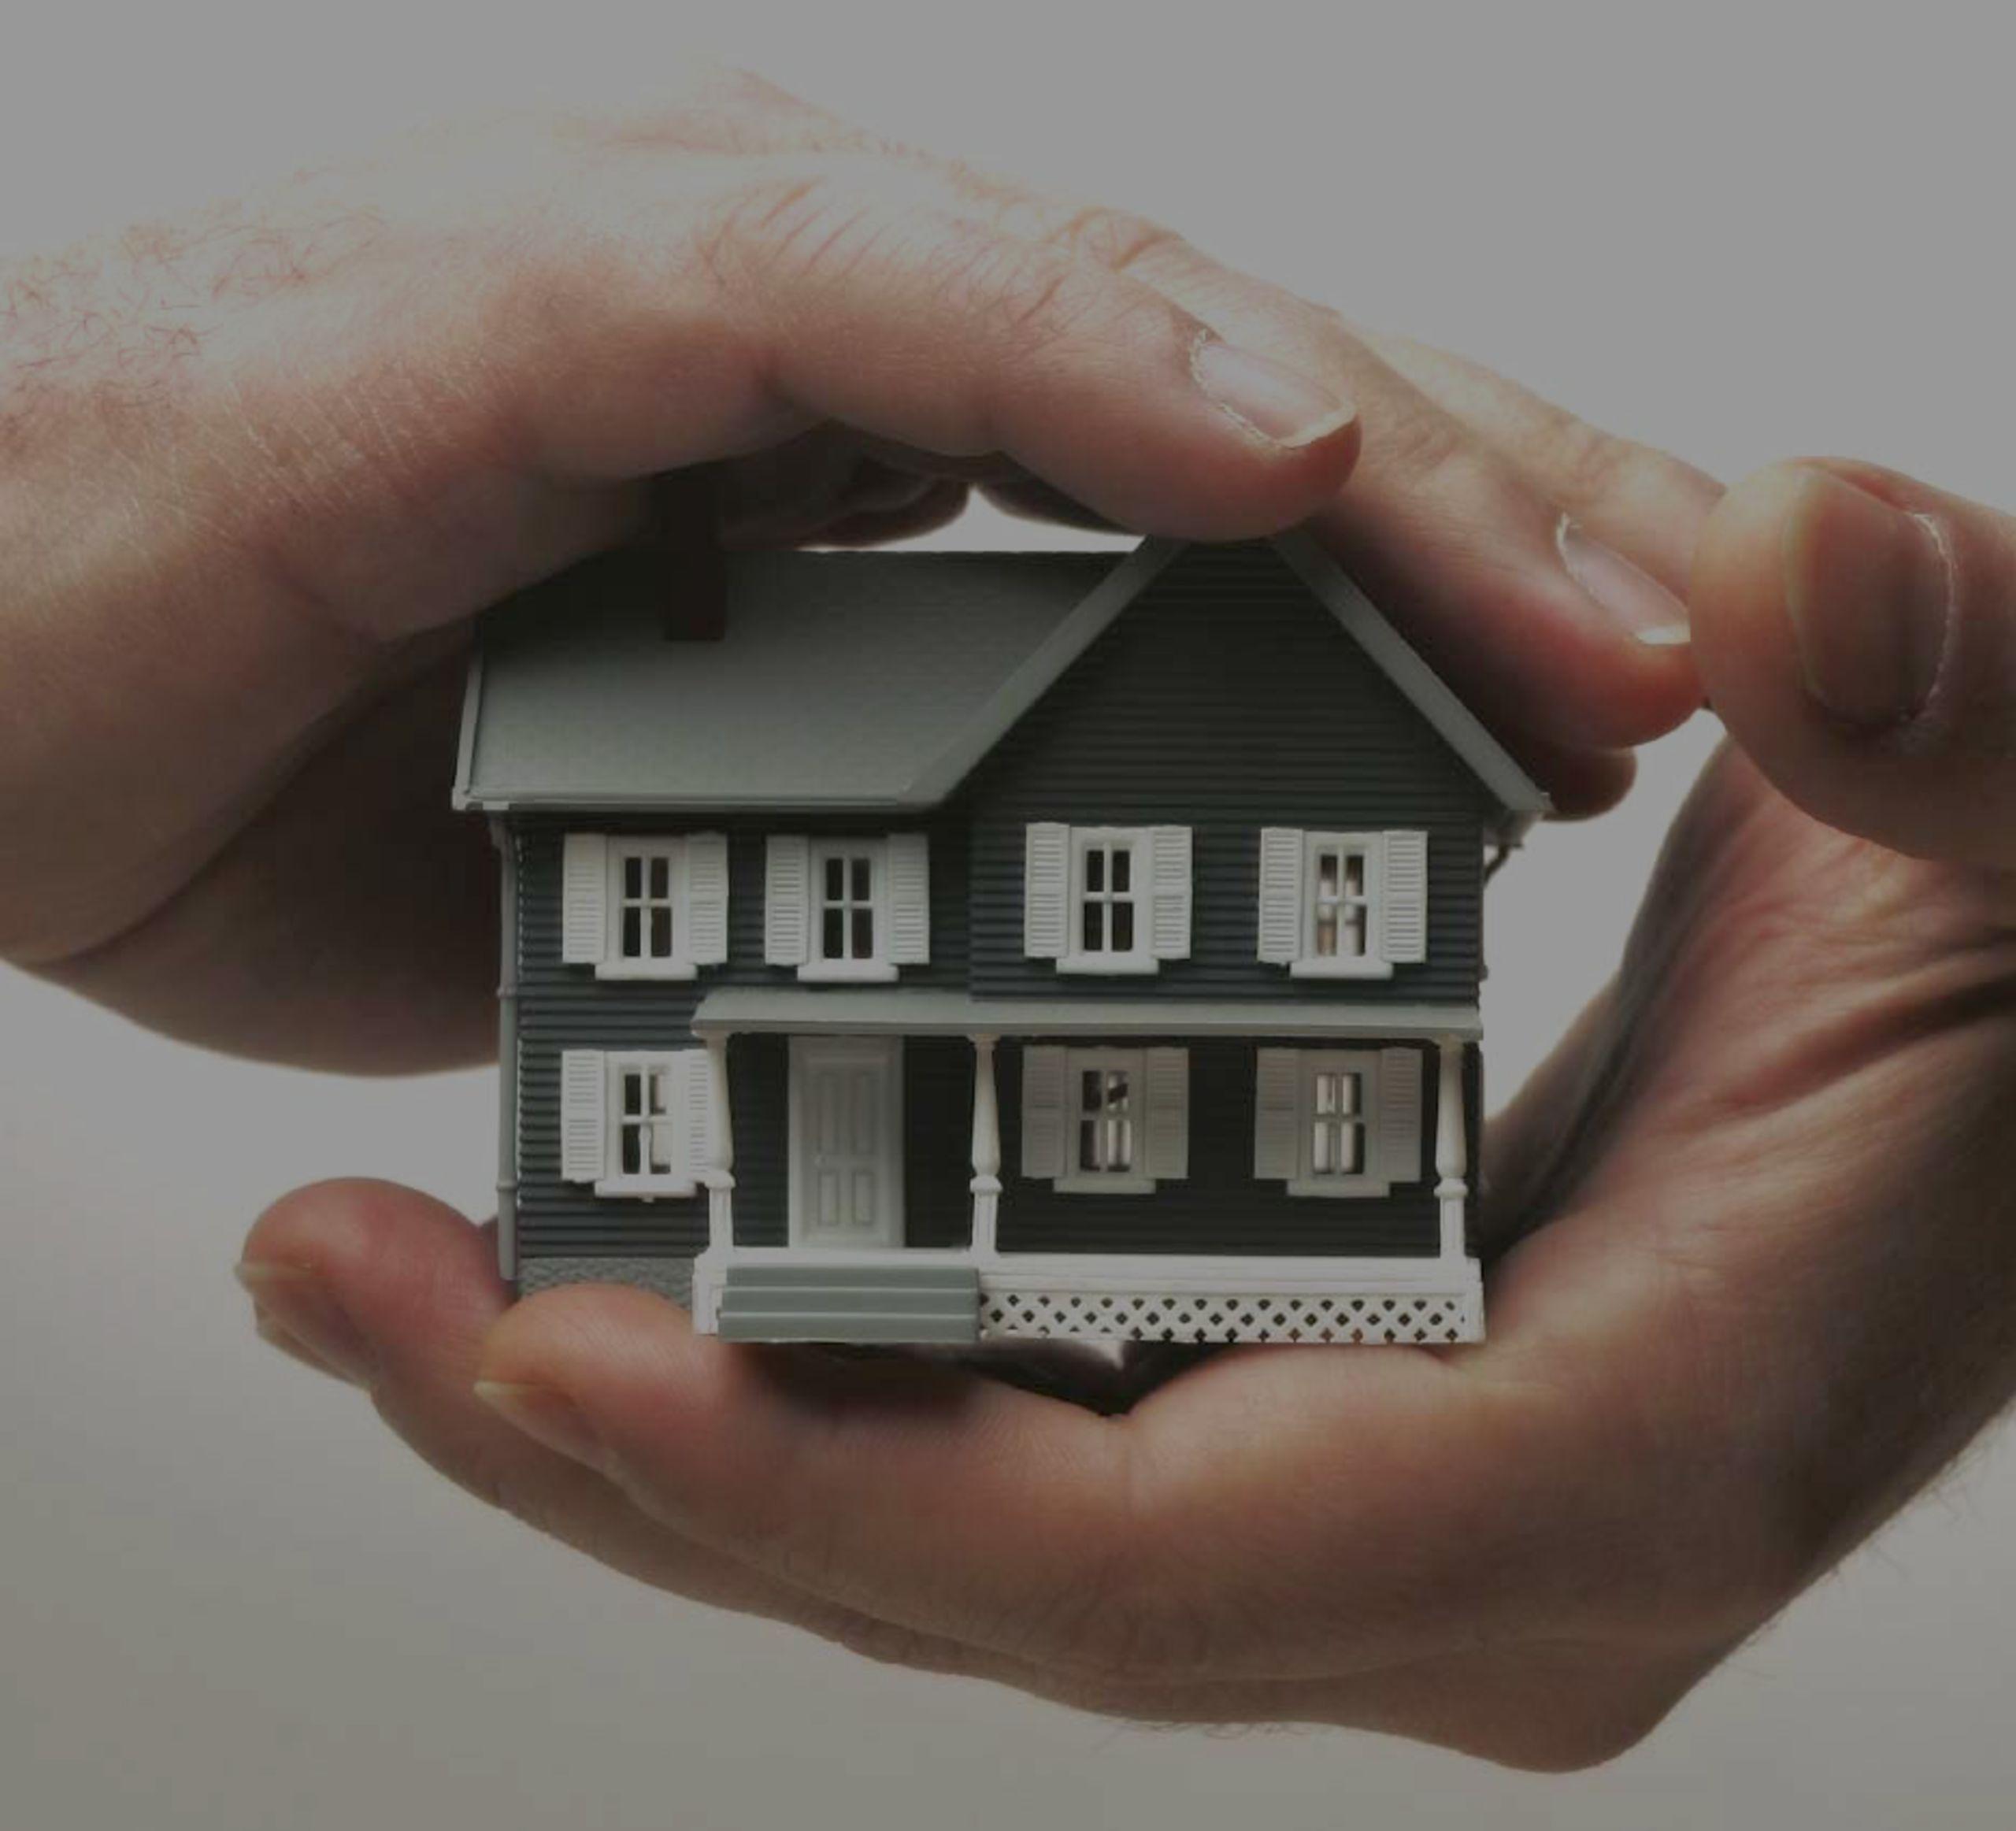 Homeowners Insurance vs Home Warranty